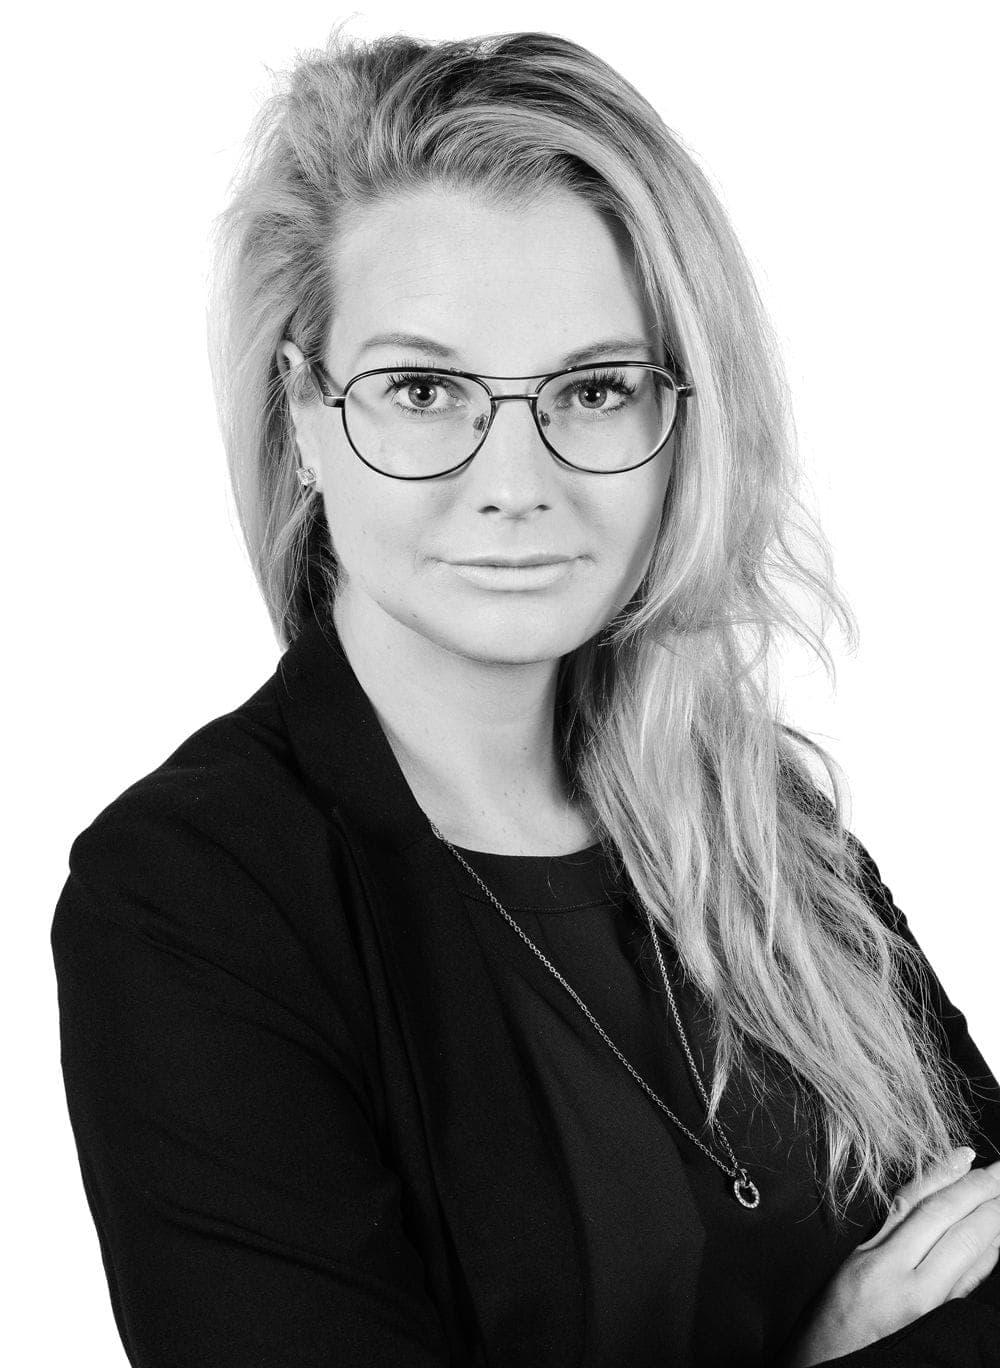 Frida Sundqvist